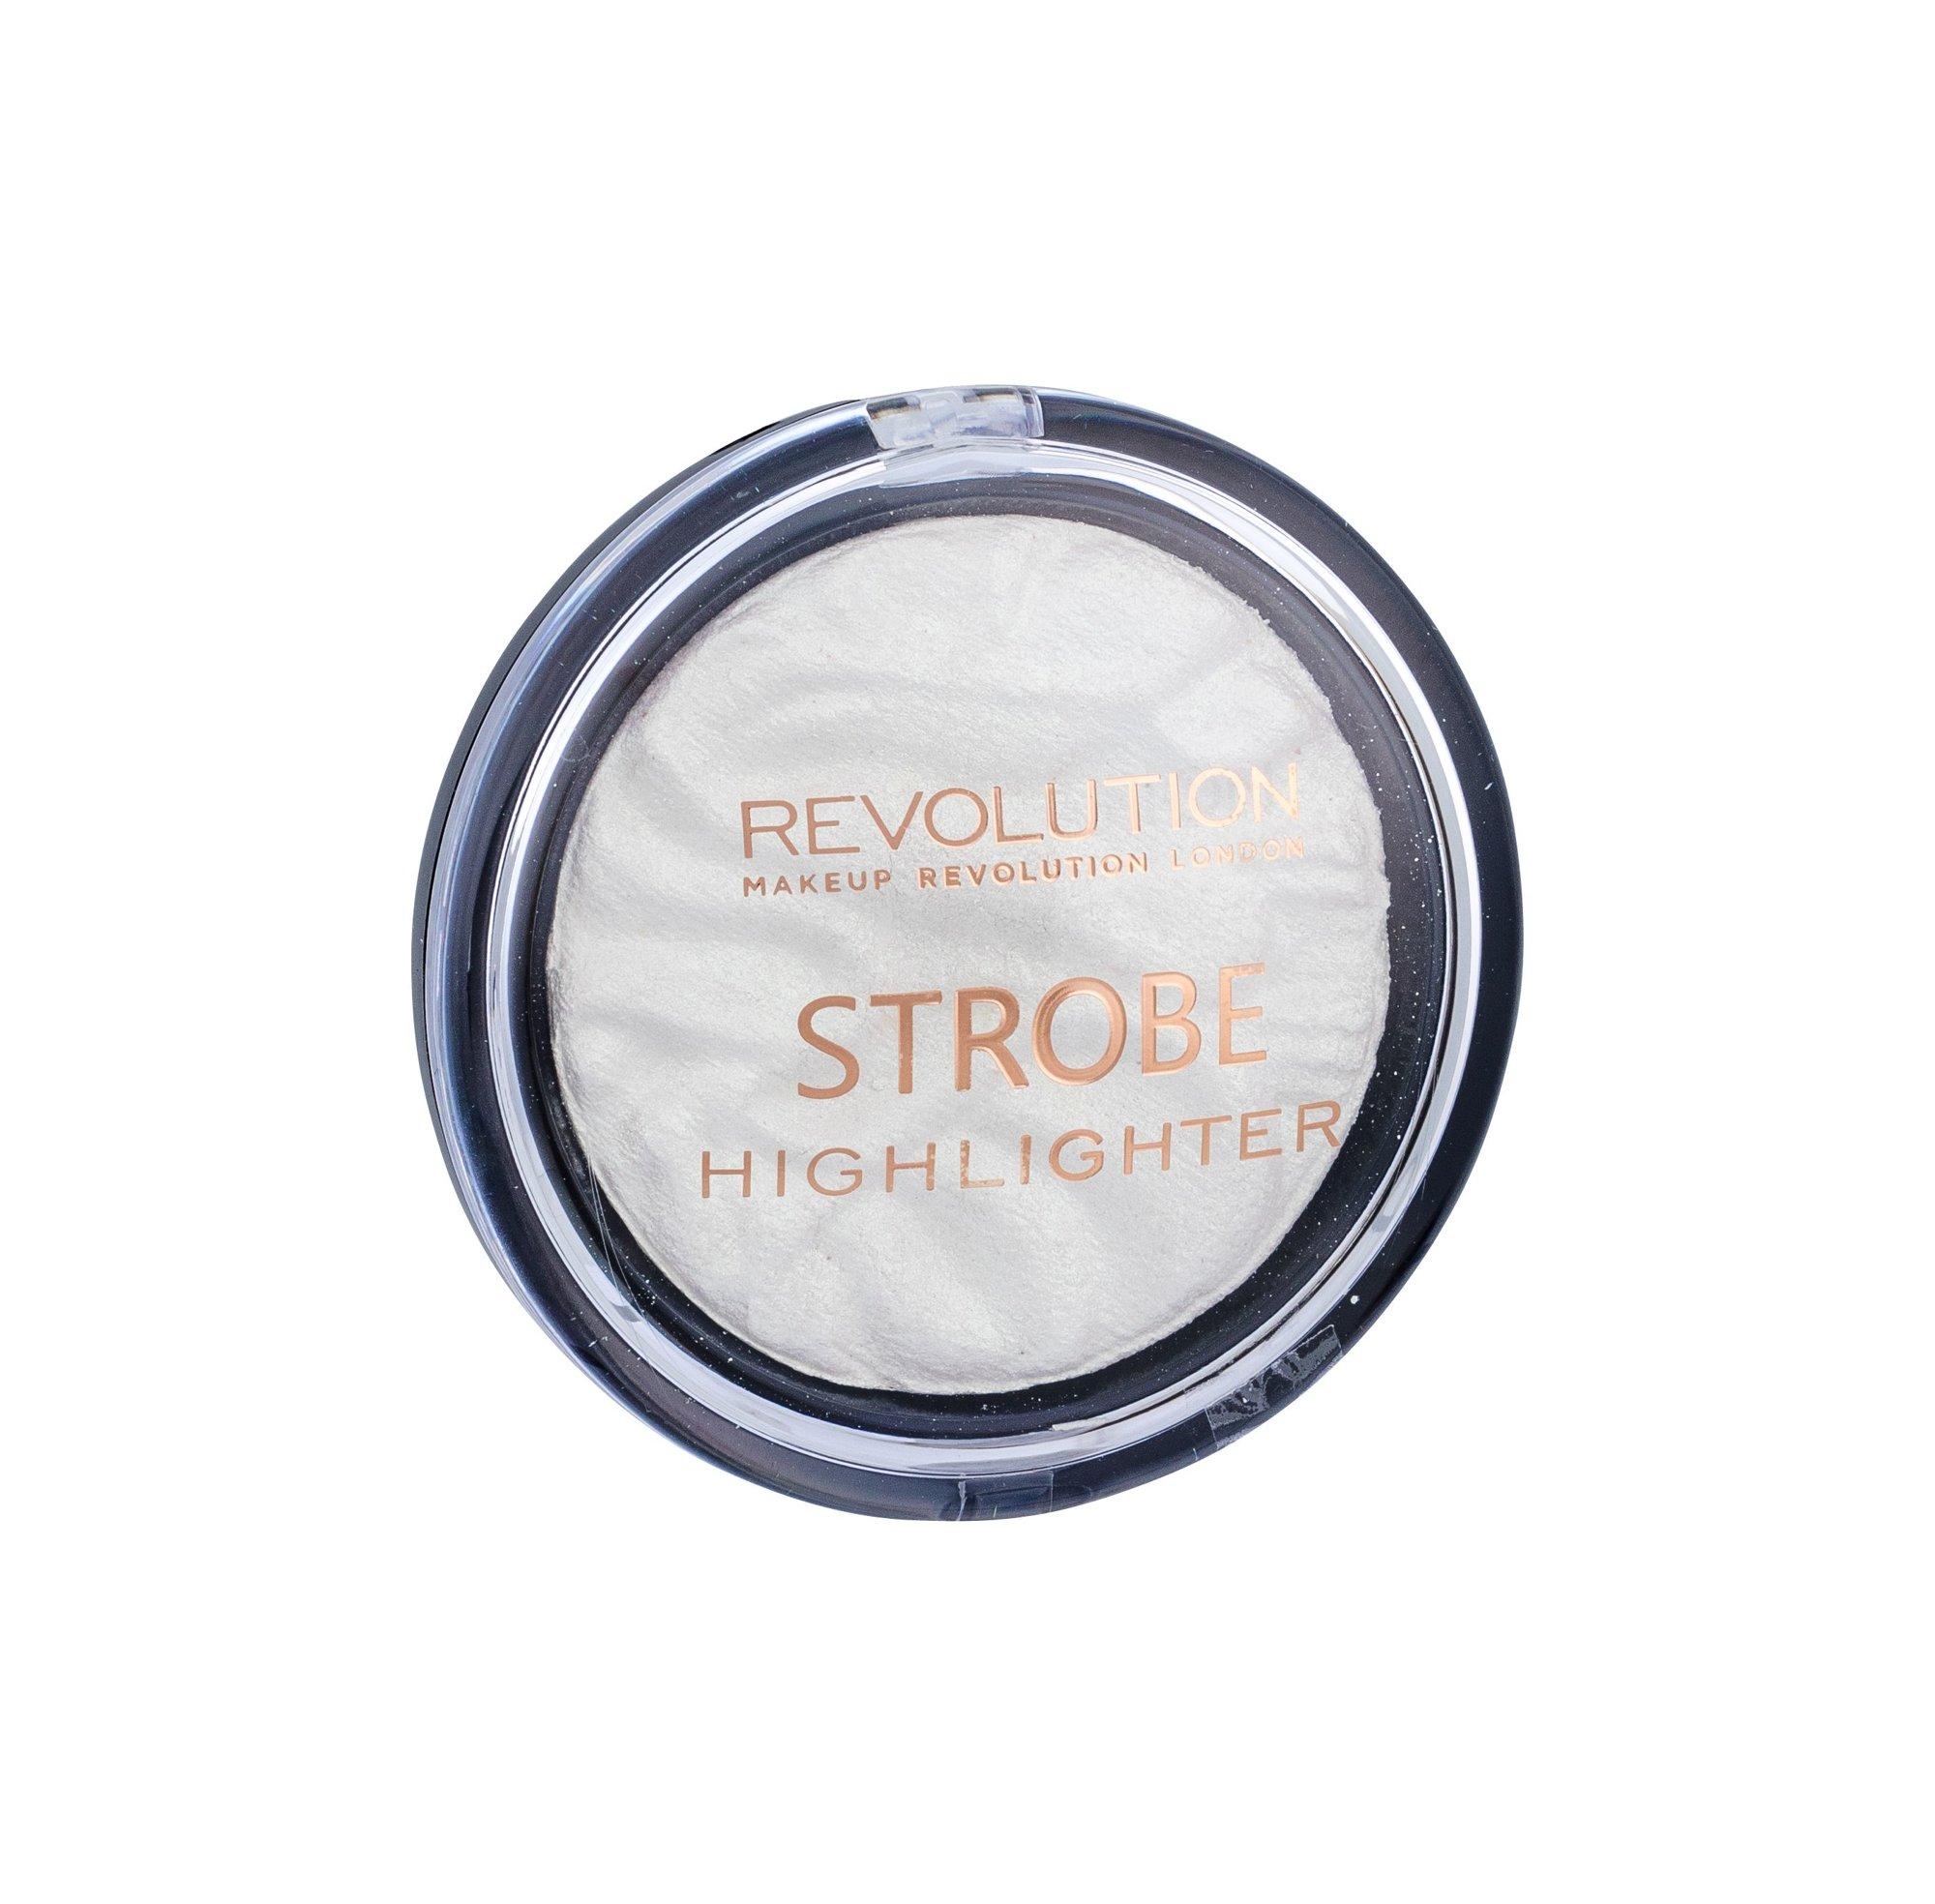 Makeup Revolution London Strobe Highlighter Cosmetic 7,5g Flash